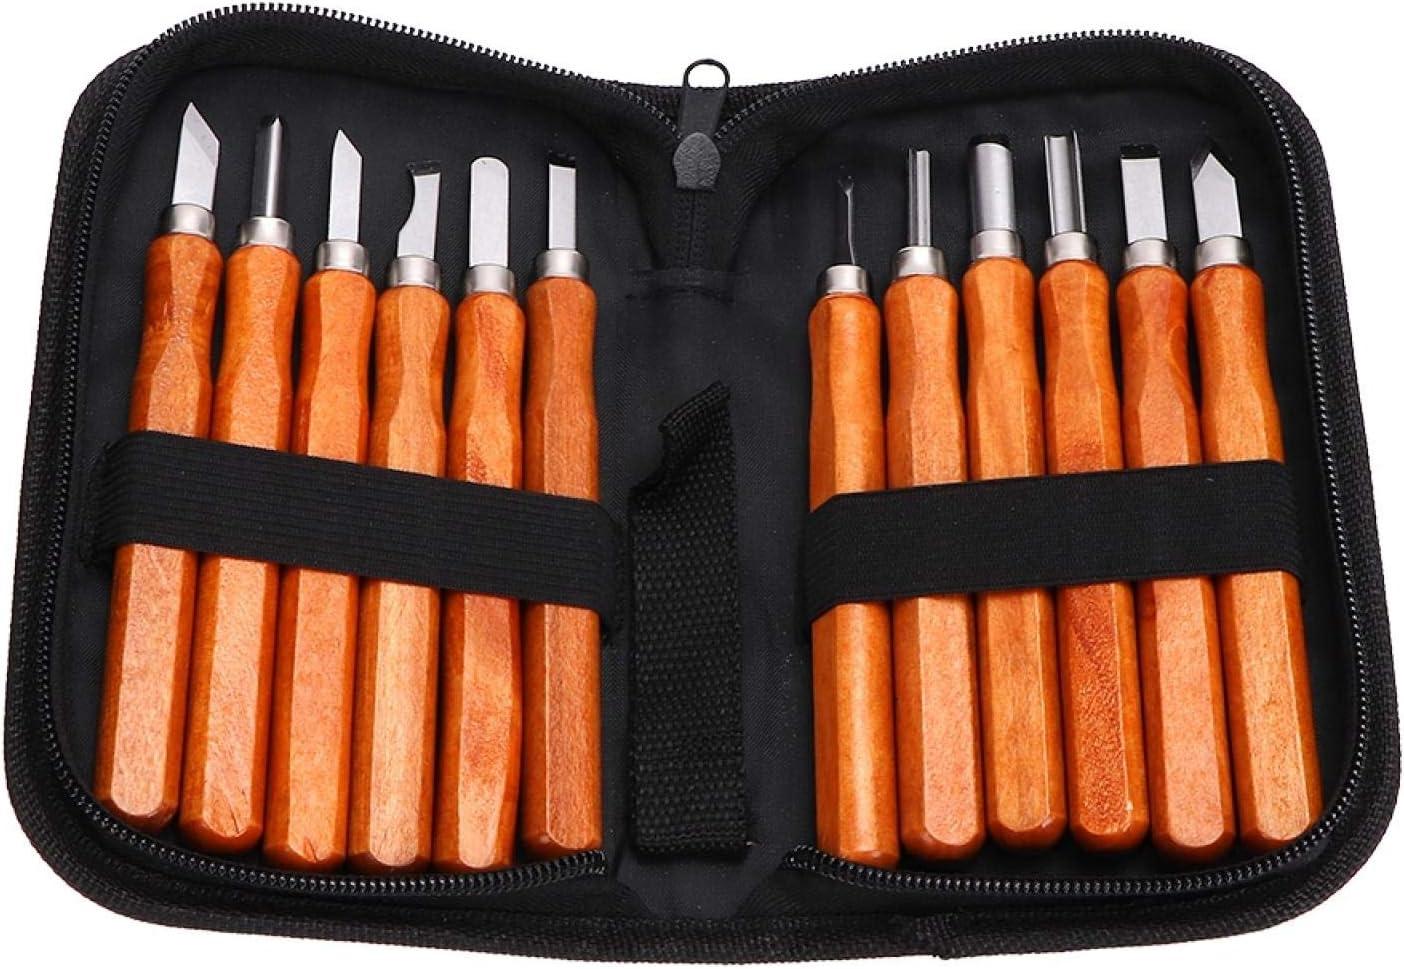 12Pcs Max 75% OFF Set Wood Directly managed store Carving Cutter Carvi Imitation kit Mahogany